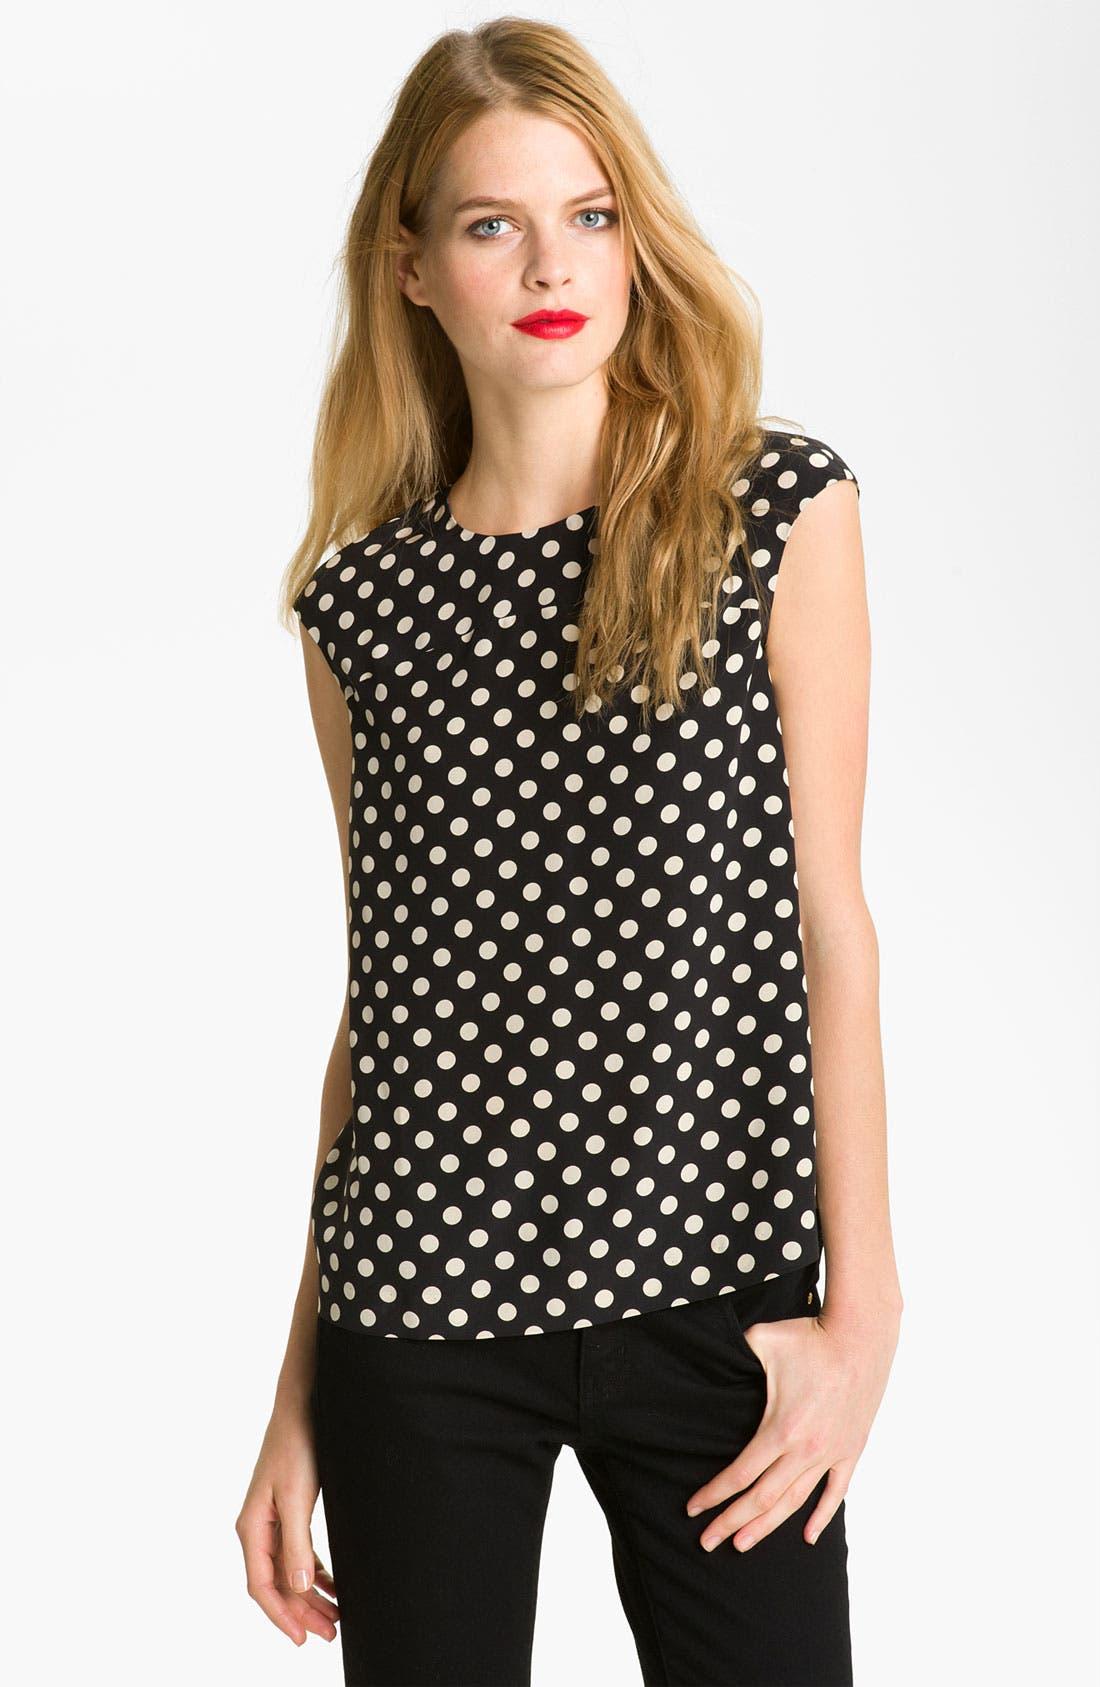 Alternate Image 1 Selected - kate spade new york 'fran' silk blouse